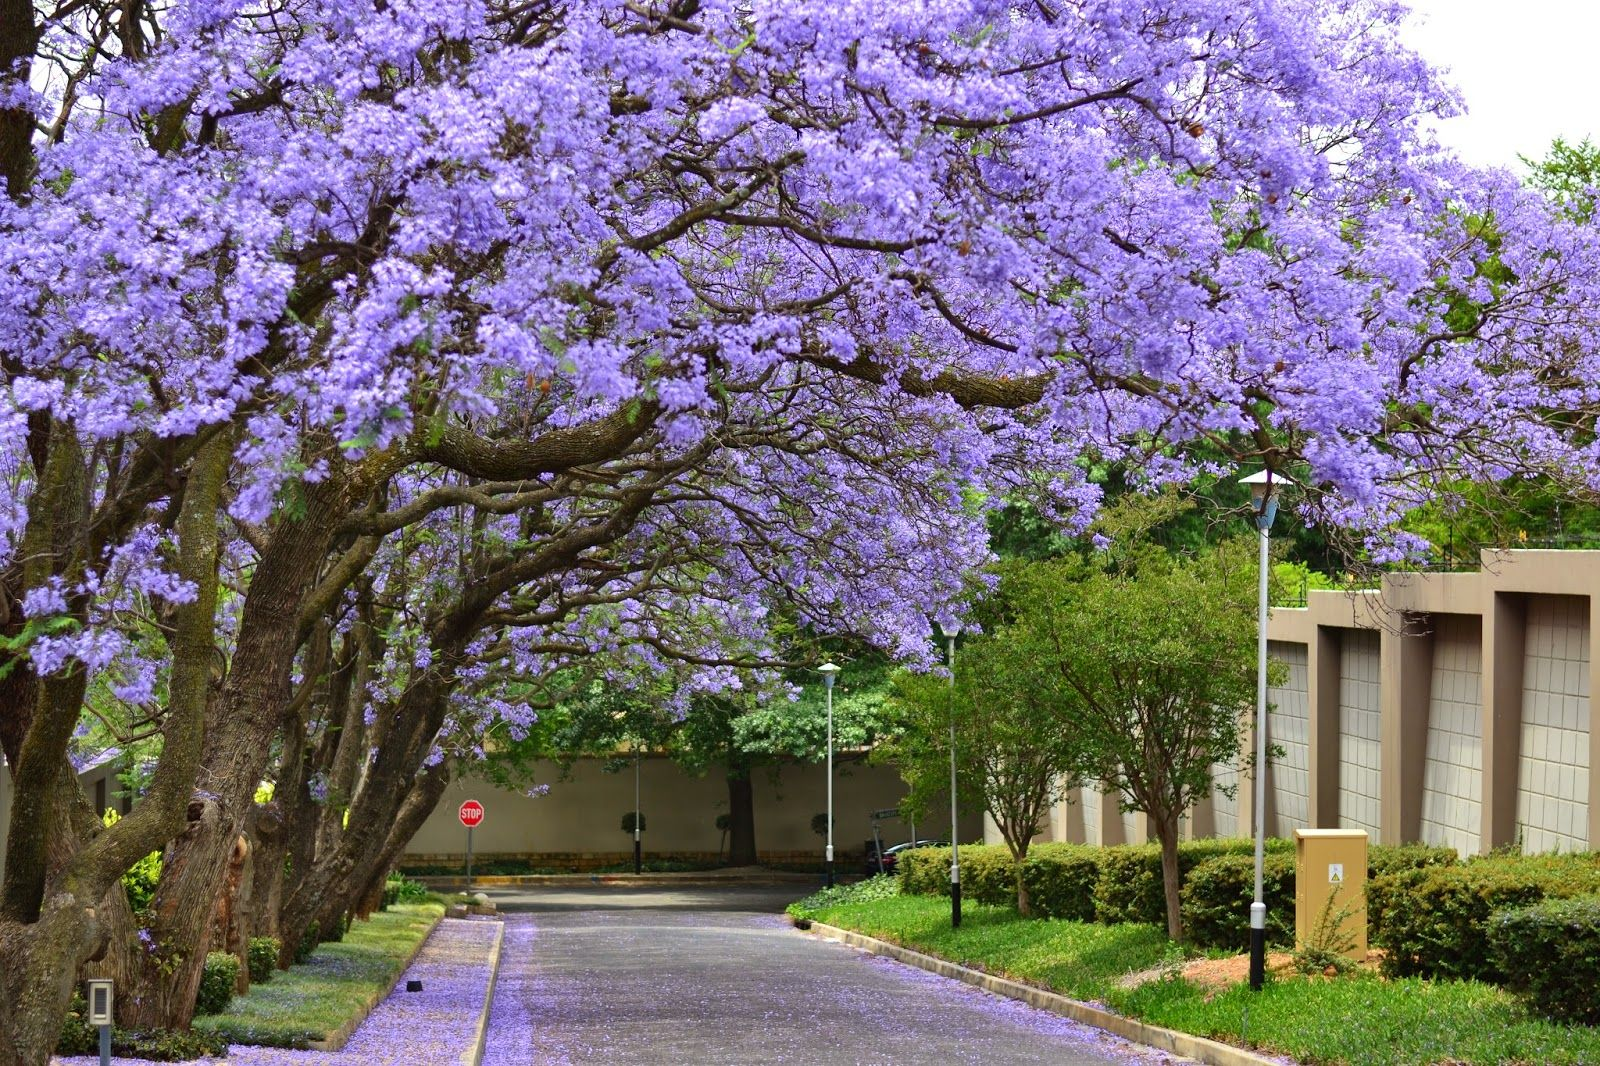 Jacaranda trees jhb south africa flowers pinterest jacaranda trees jhb south africa izmirmasajfo